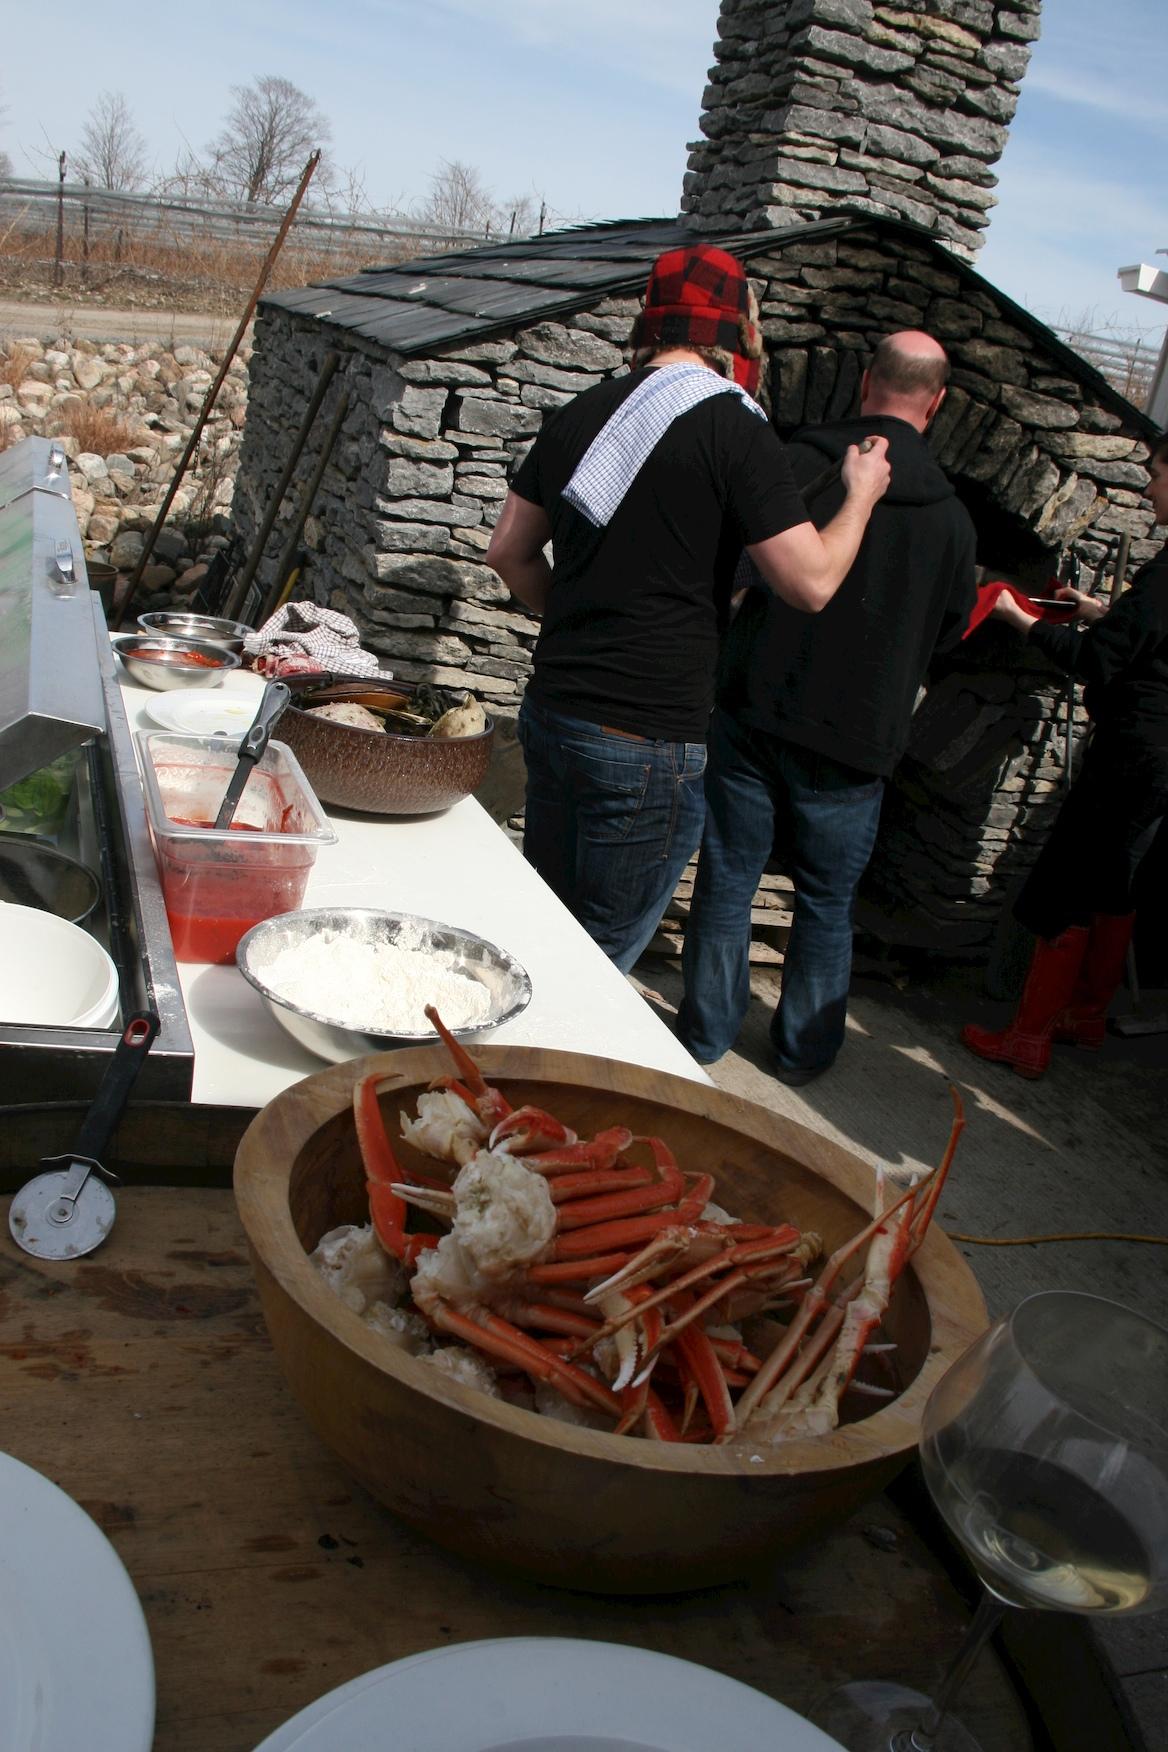 Delicious King Crab legs!